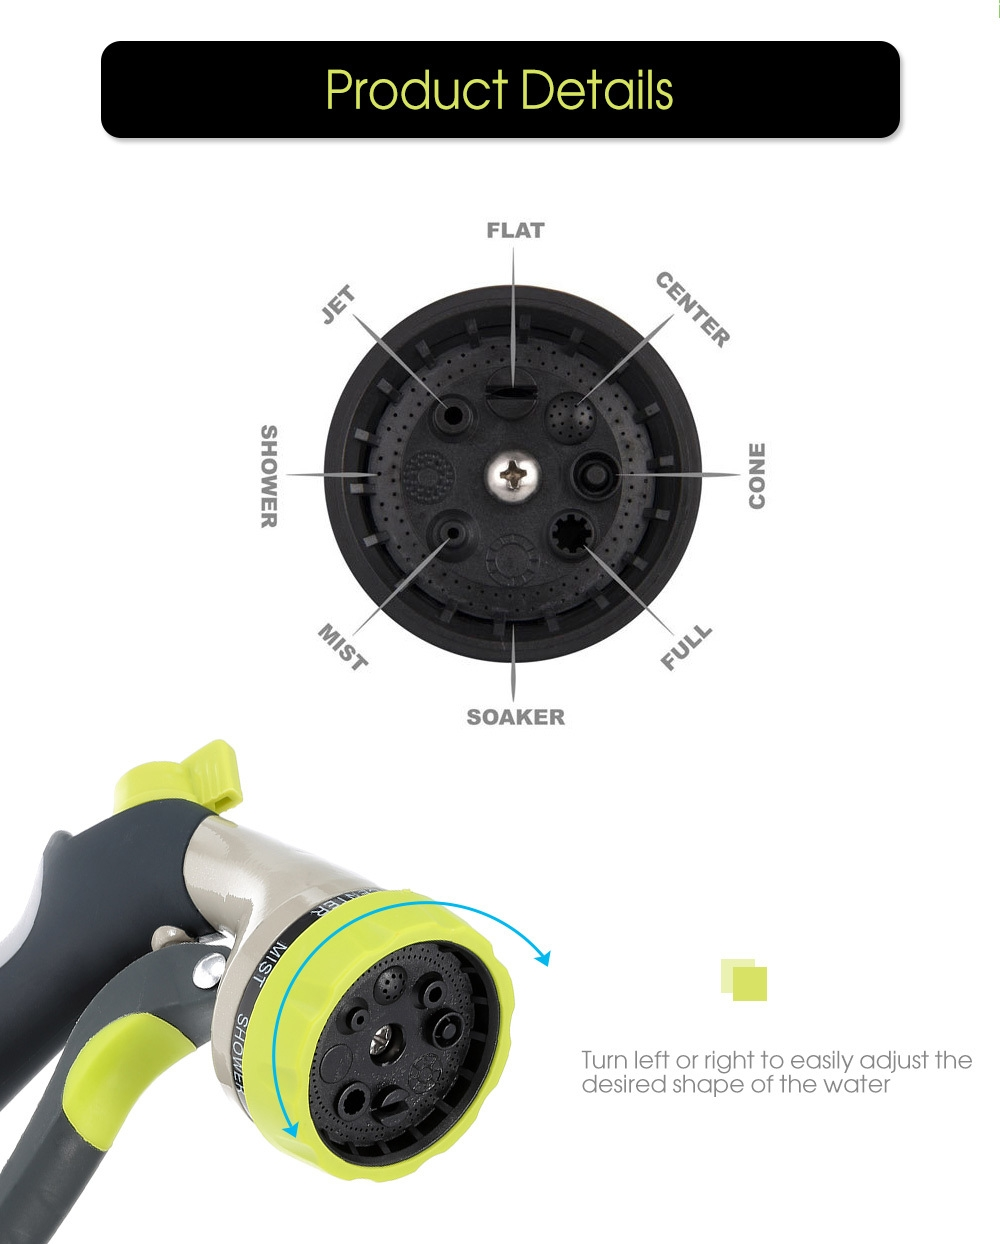 8 Function Garden Hose Nozzle Hand Sprayer